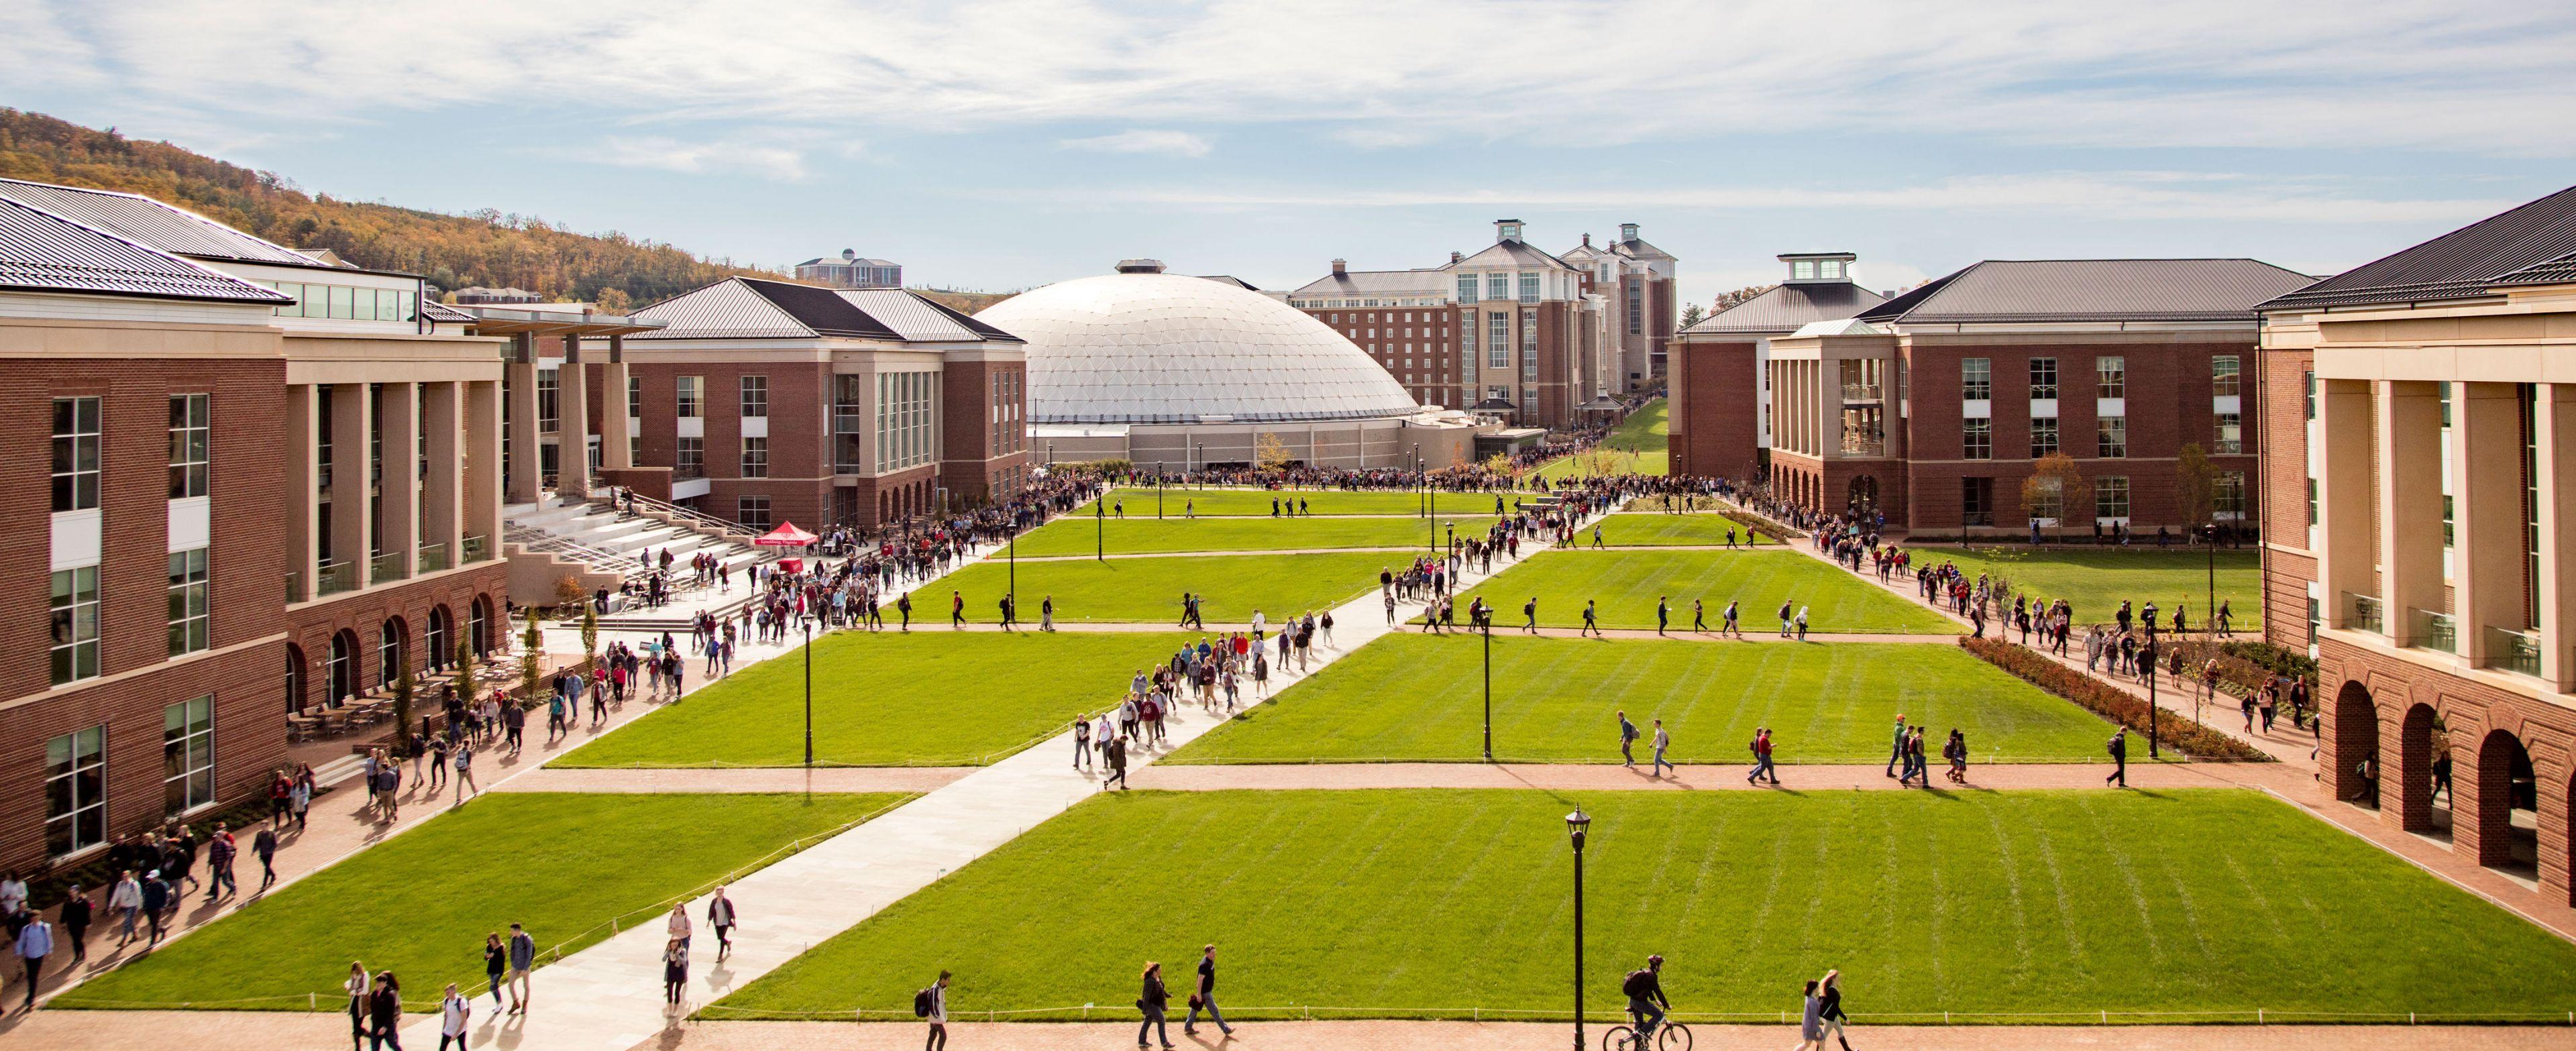 Best Online College In America Online Degree Program